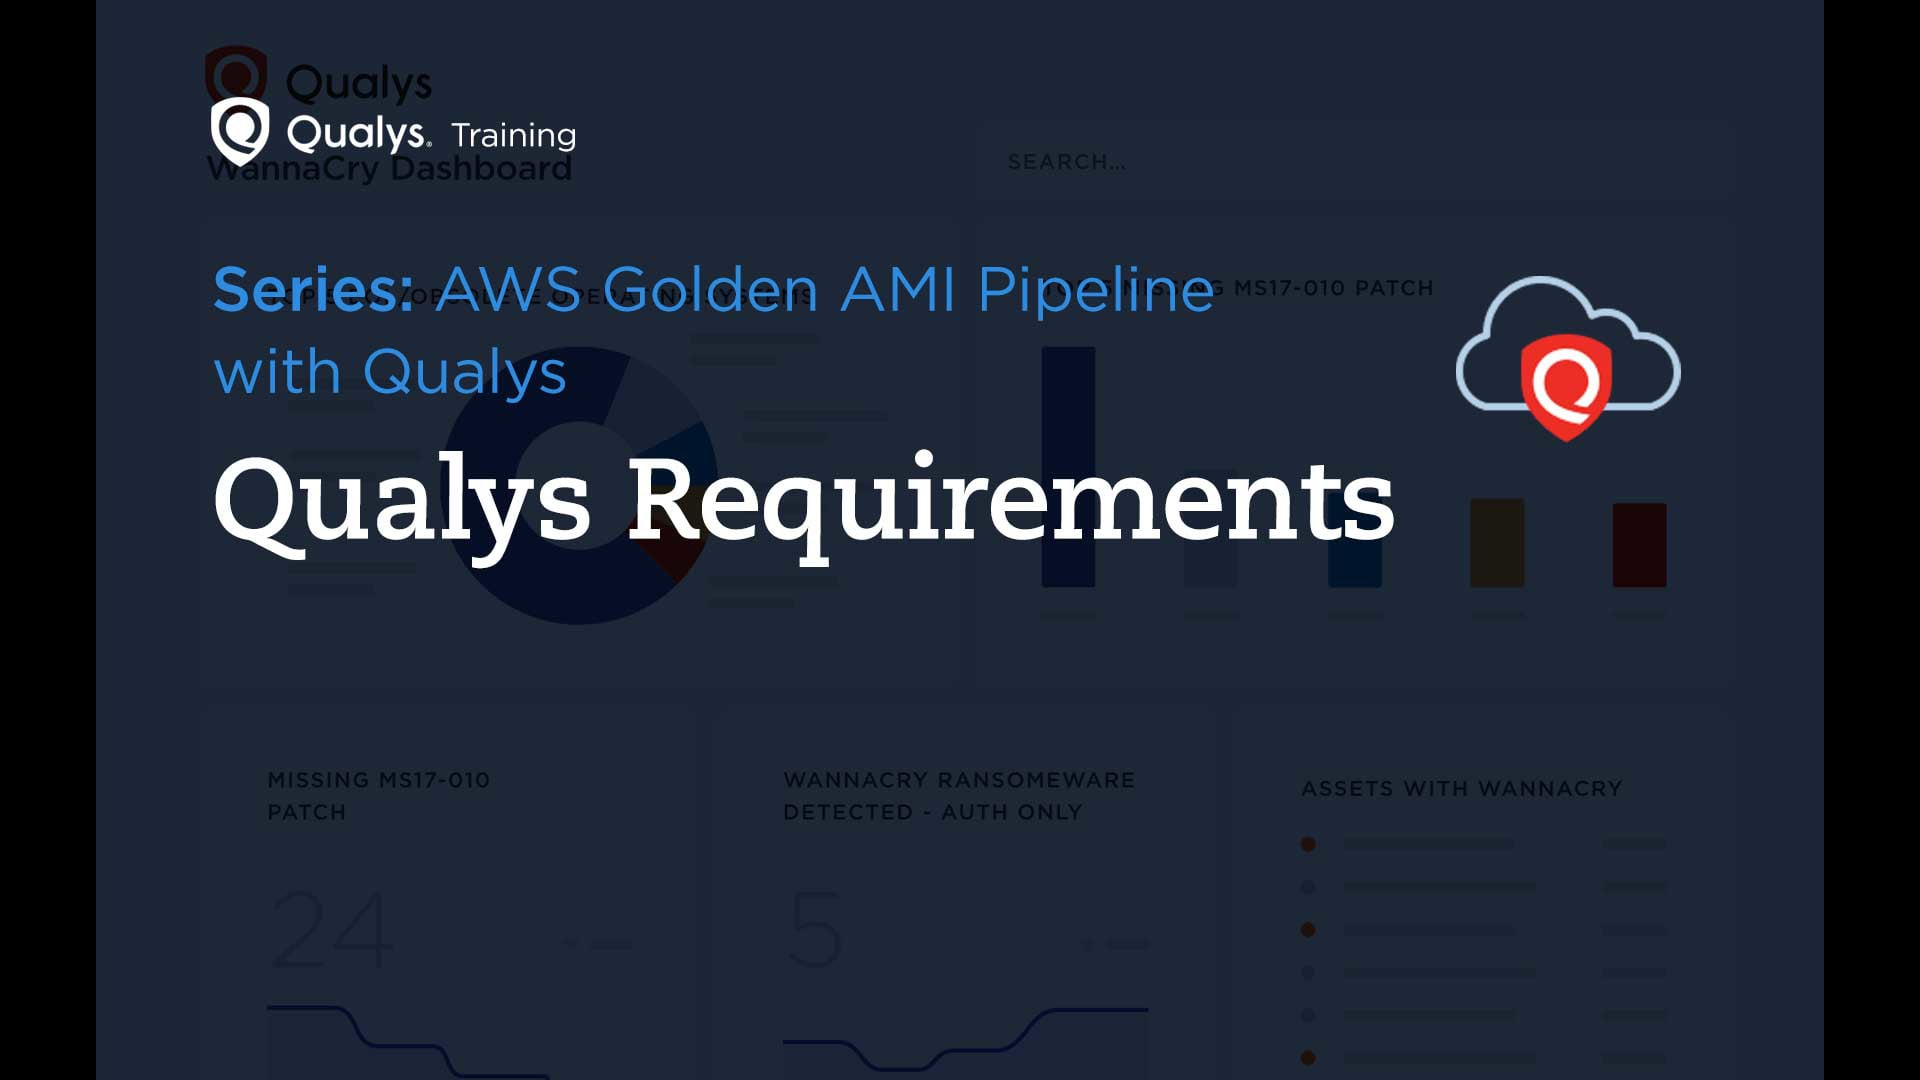 Qualys Requirements